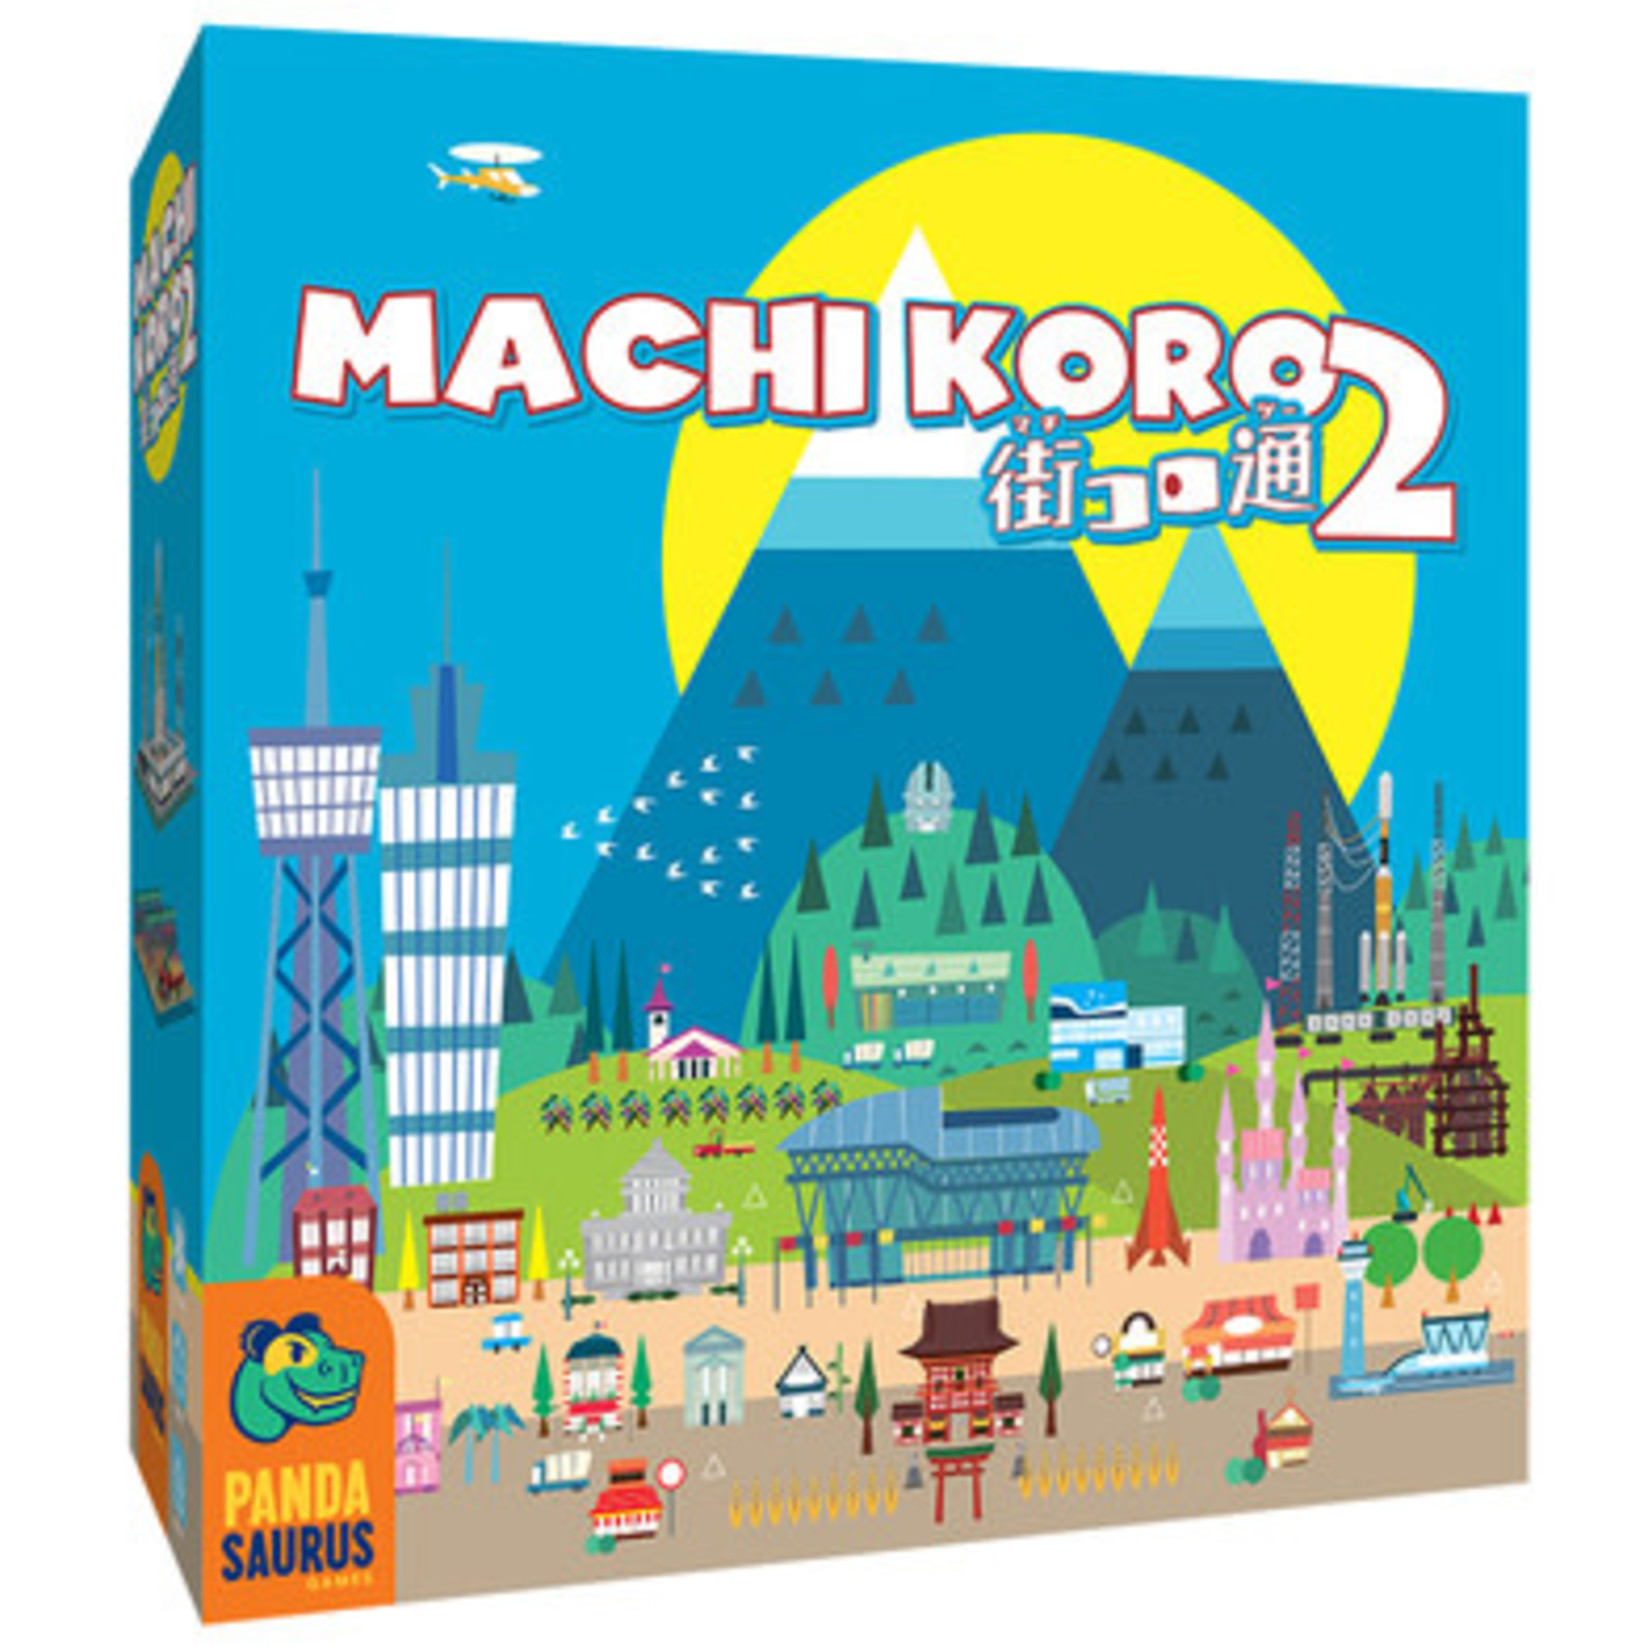 PRE-ORDER Machi Koro 2